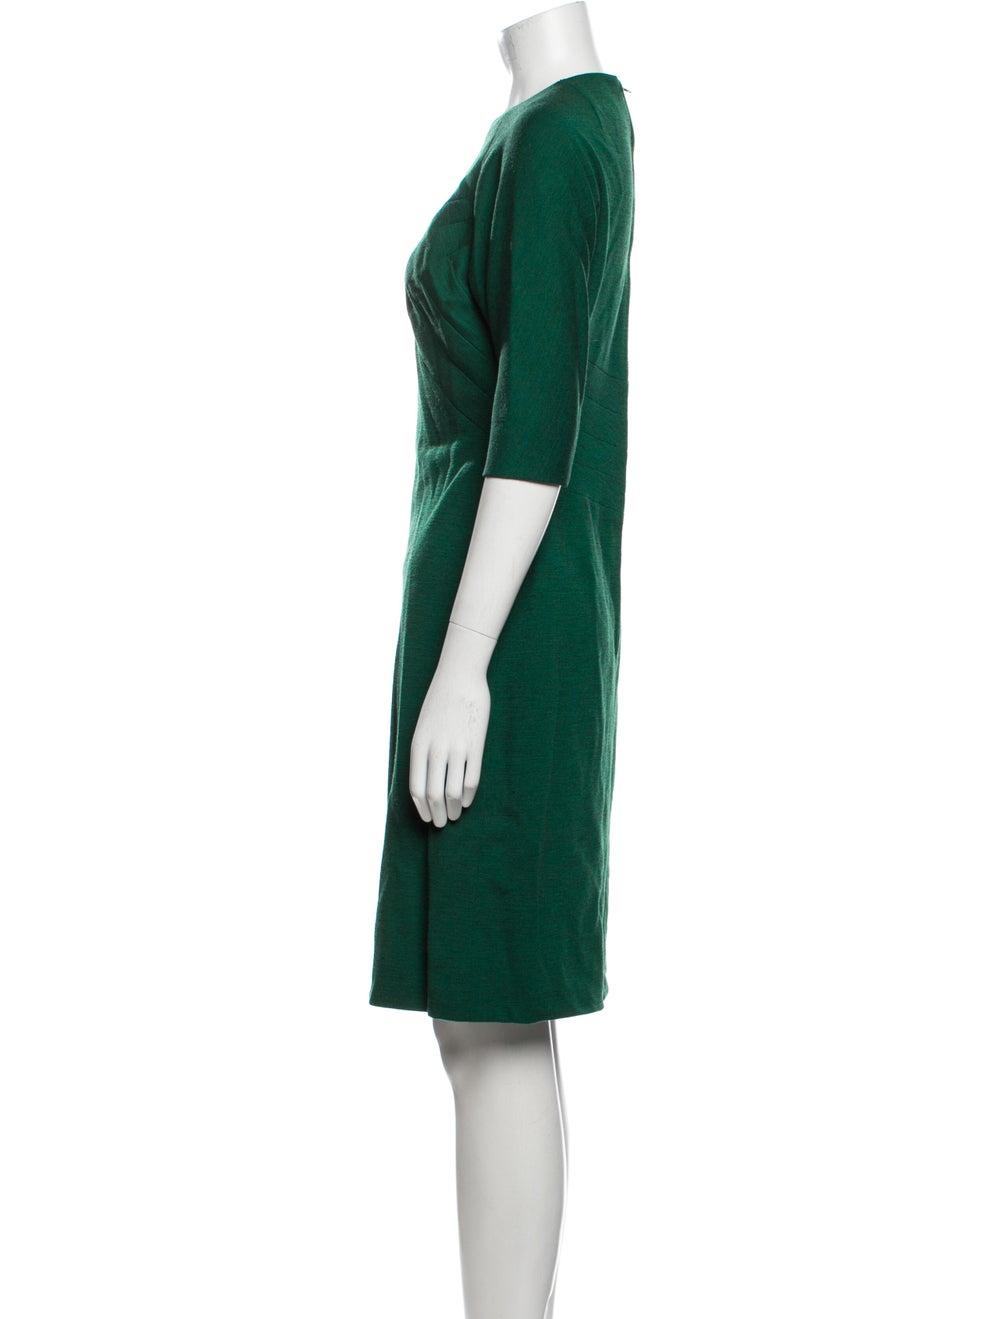 Pauline Trigere Vintage Knee-Length Dress Green - image 2